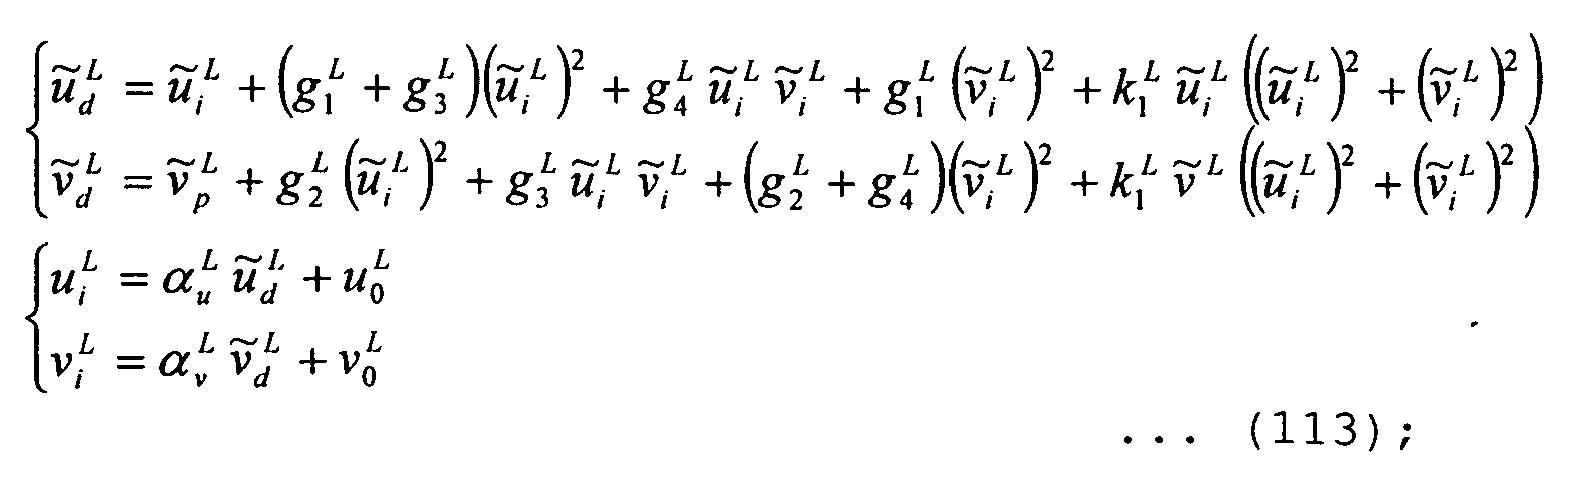 Figure imgb0224